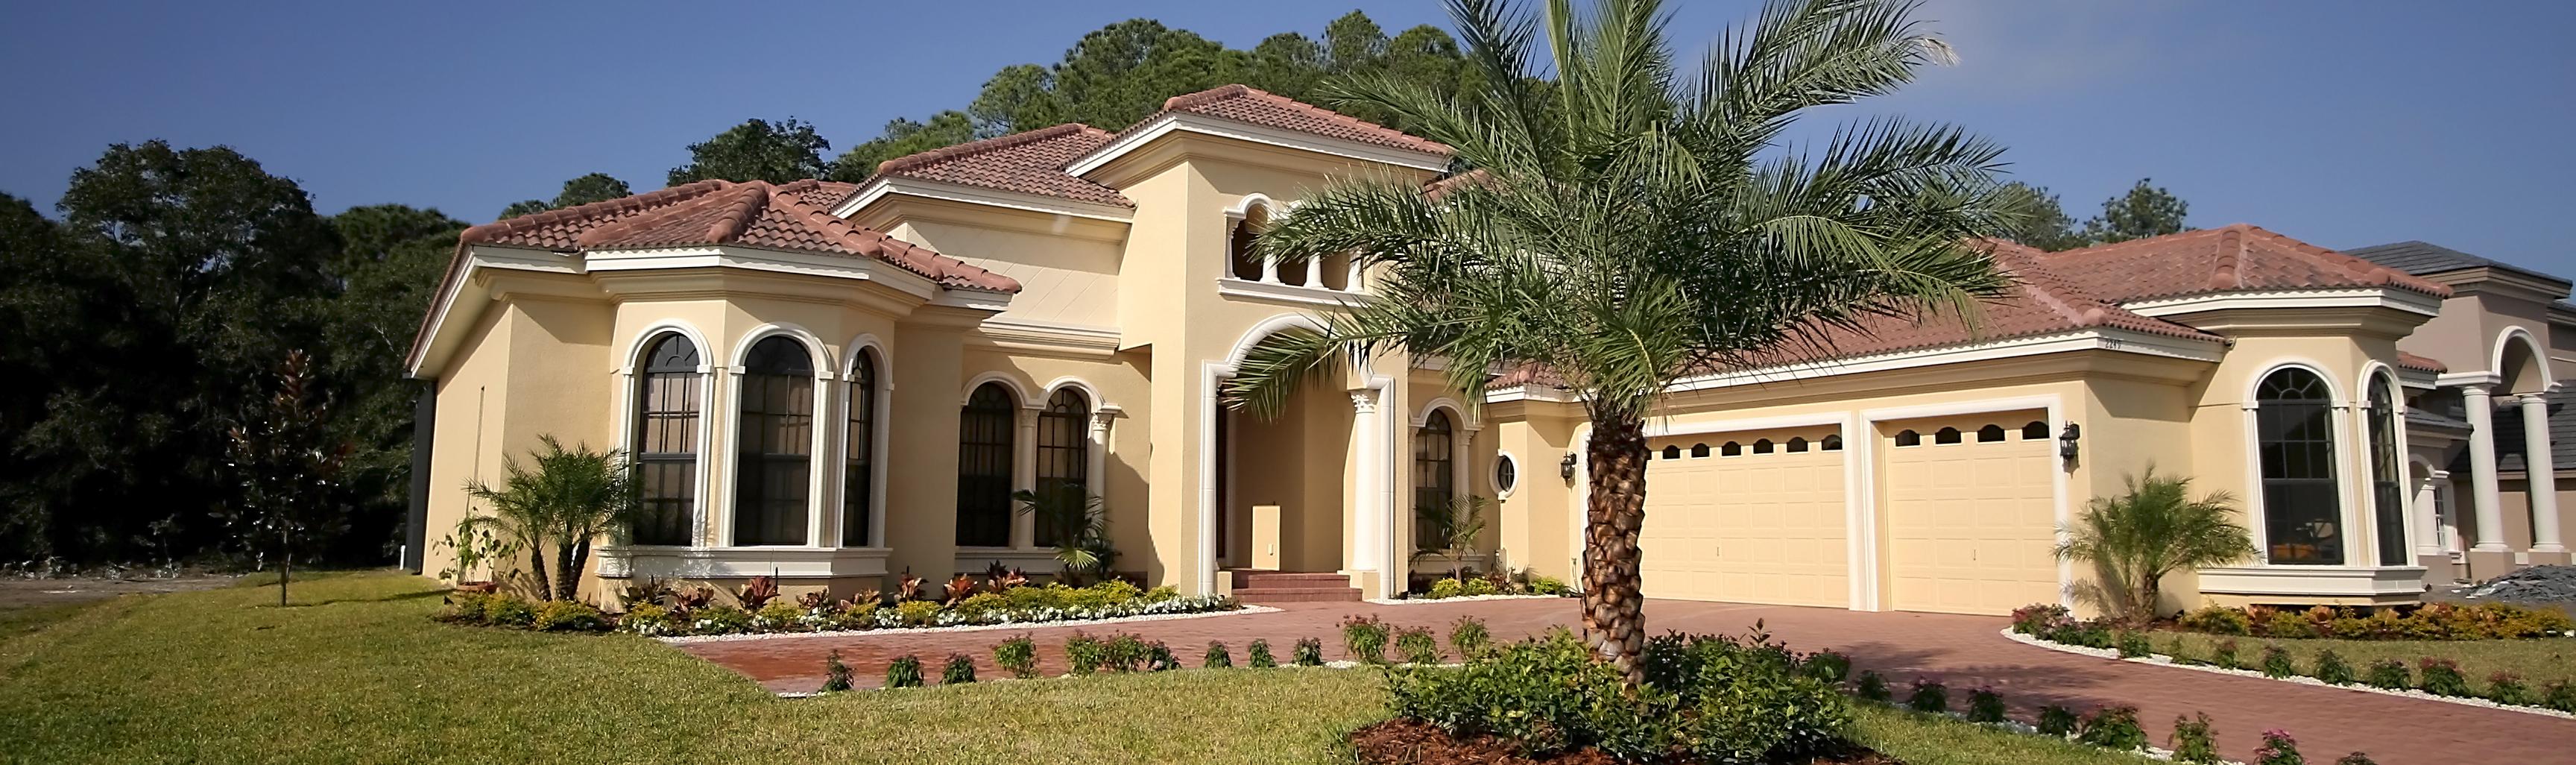 Winter Garden Property Management, Winter Garden Property Managers ...